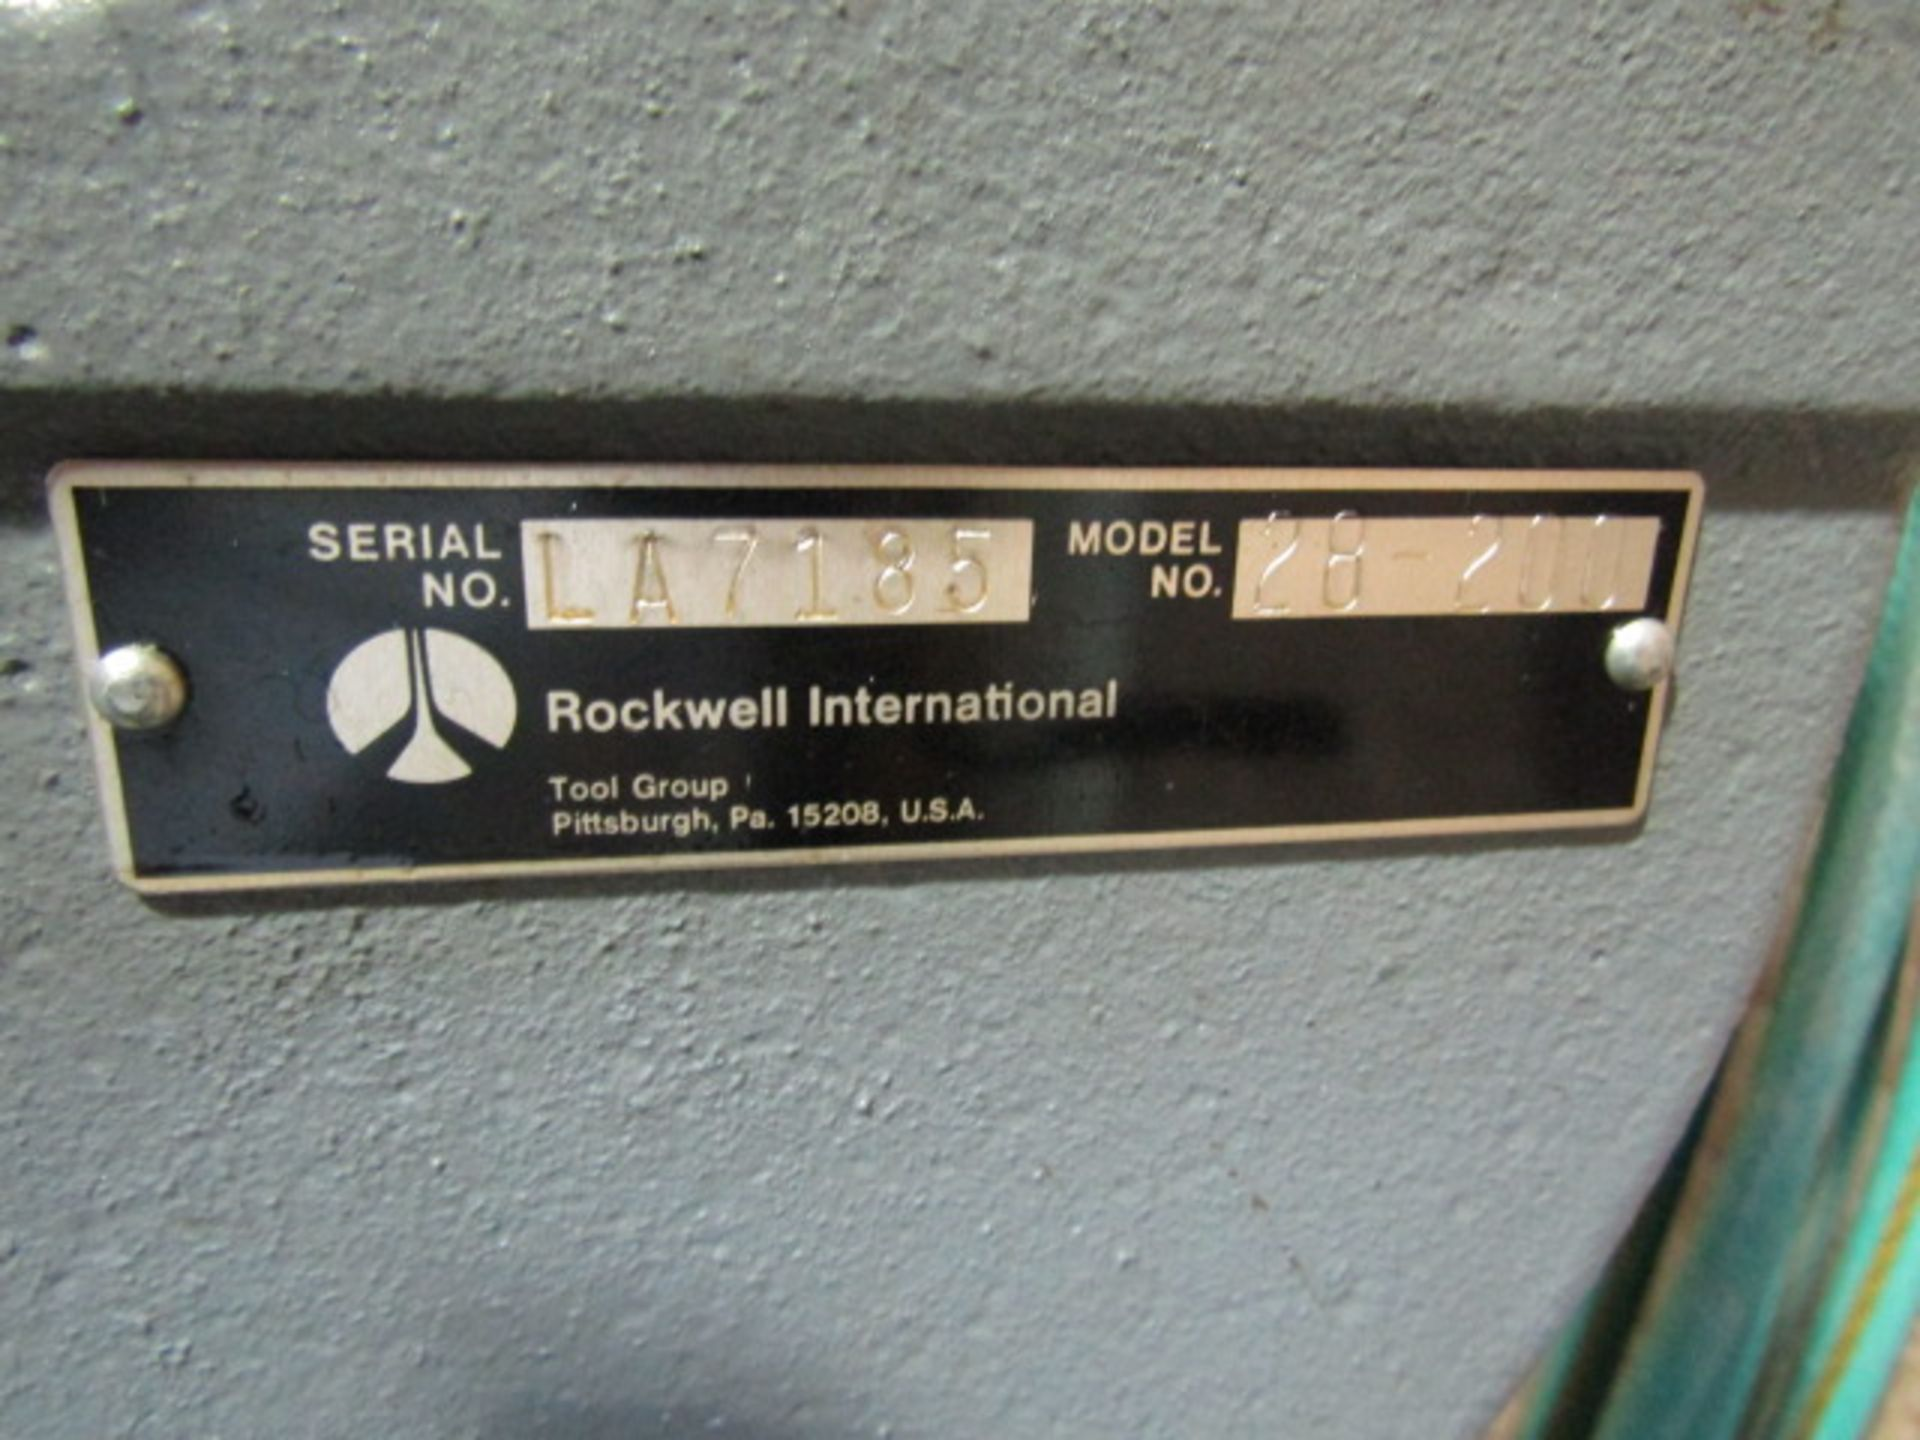 Lot 294 - Rockwell Band Saw, Model #28 200, Serial #LA7185